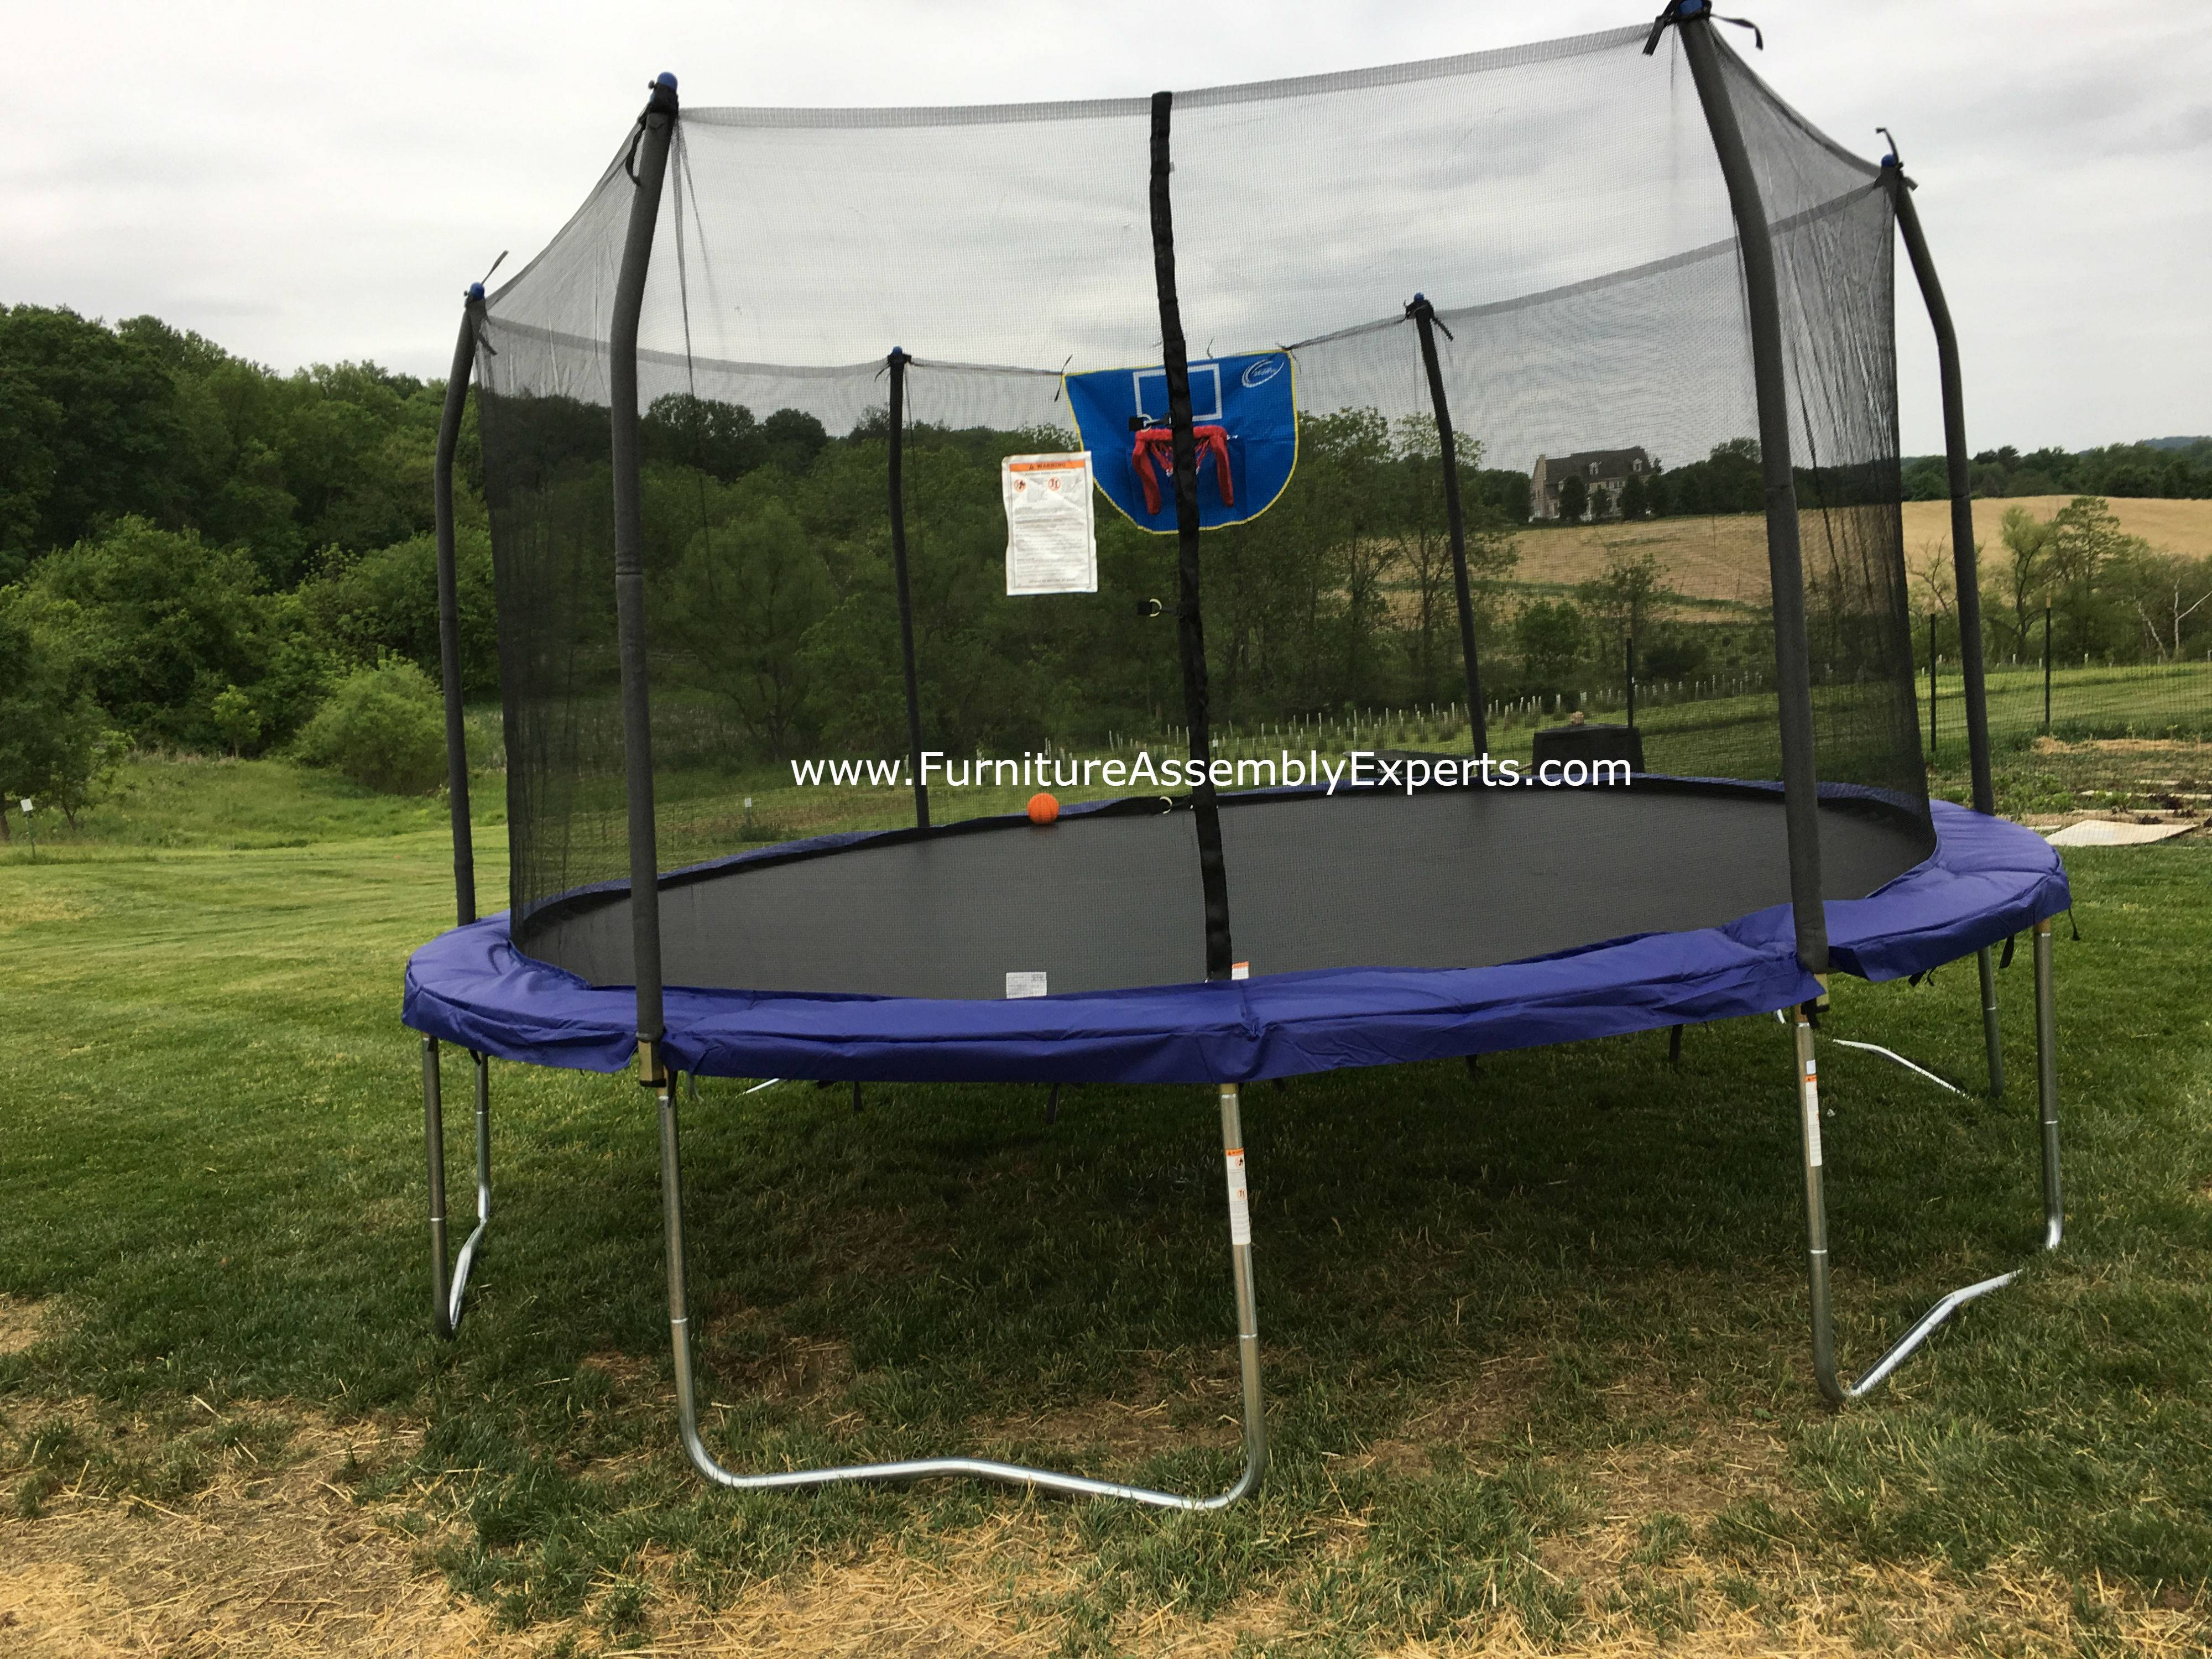 skywalker trampoline removal service in great falls Virginia